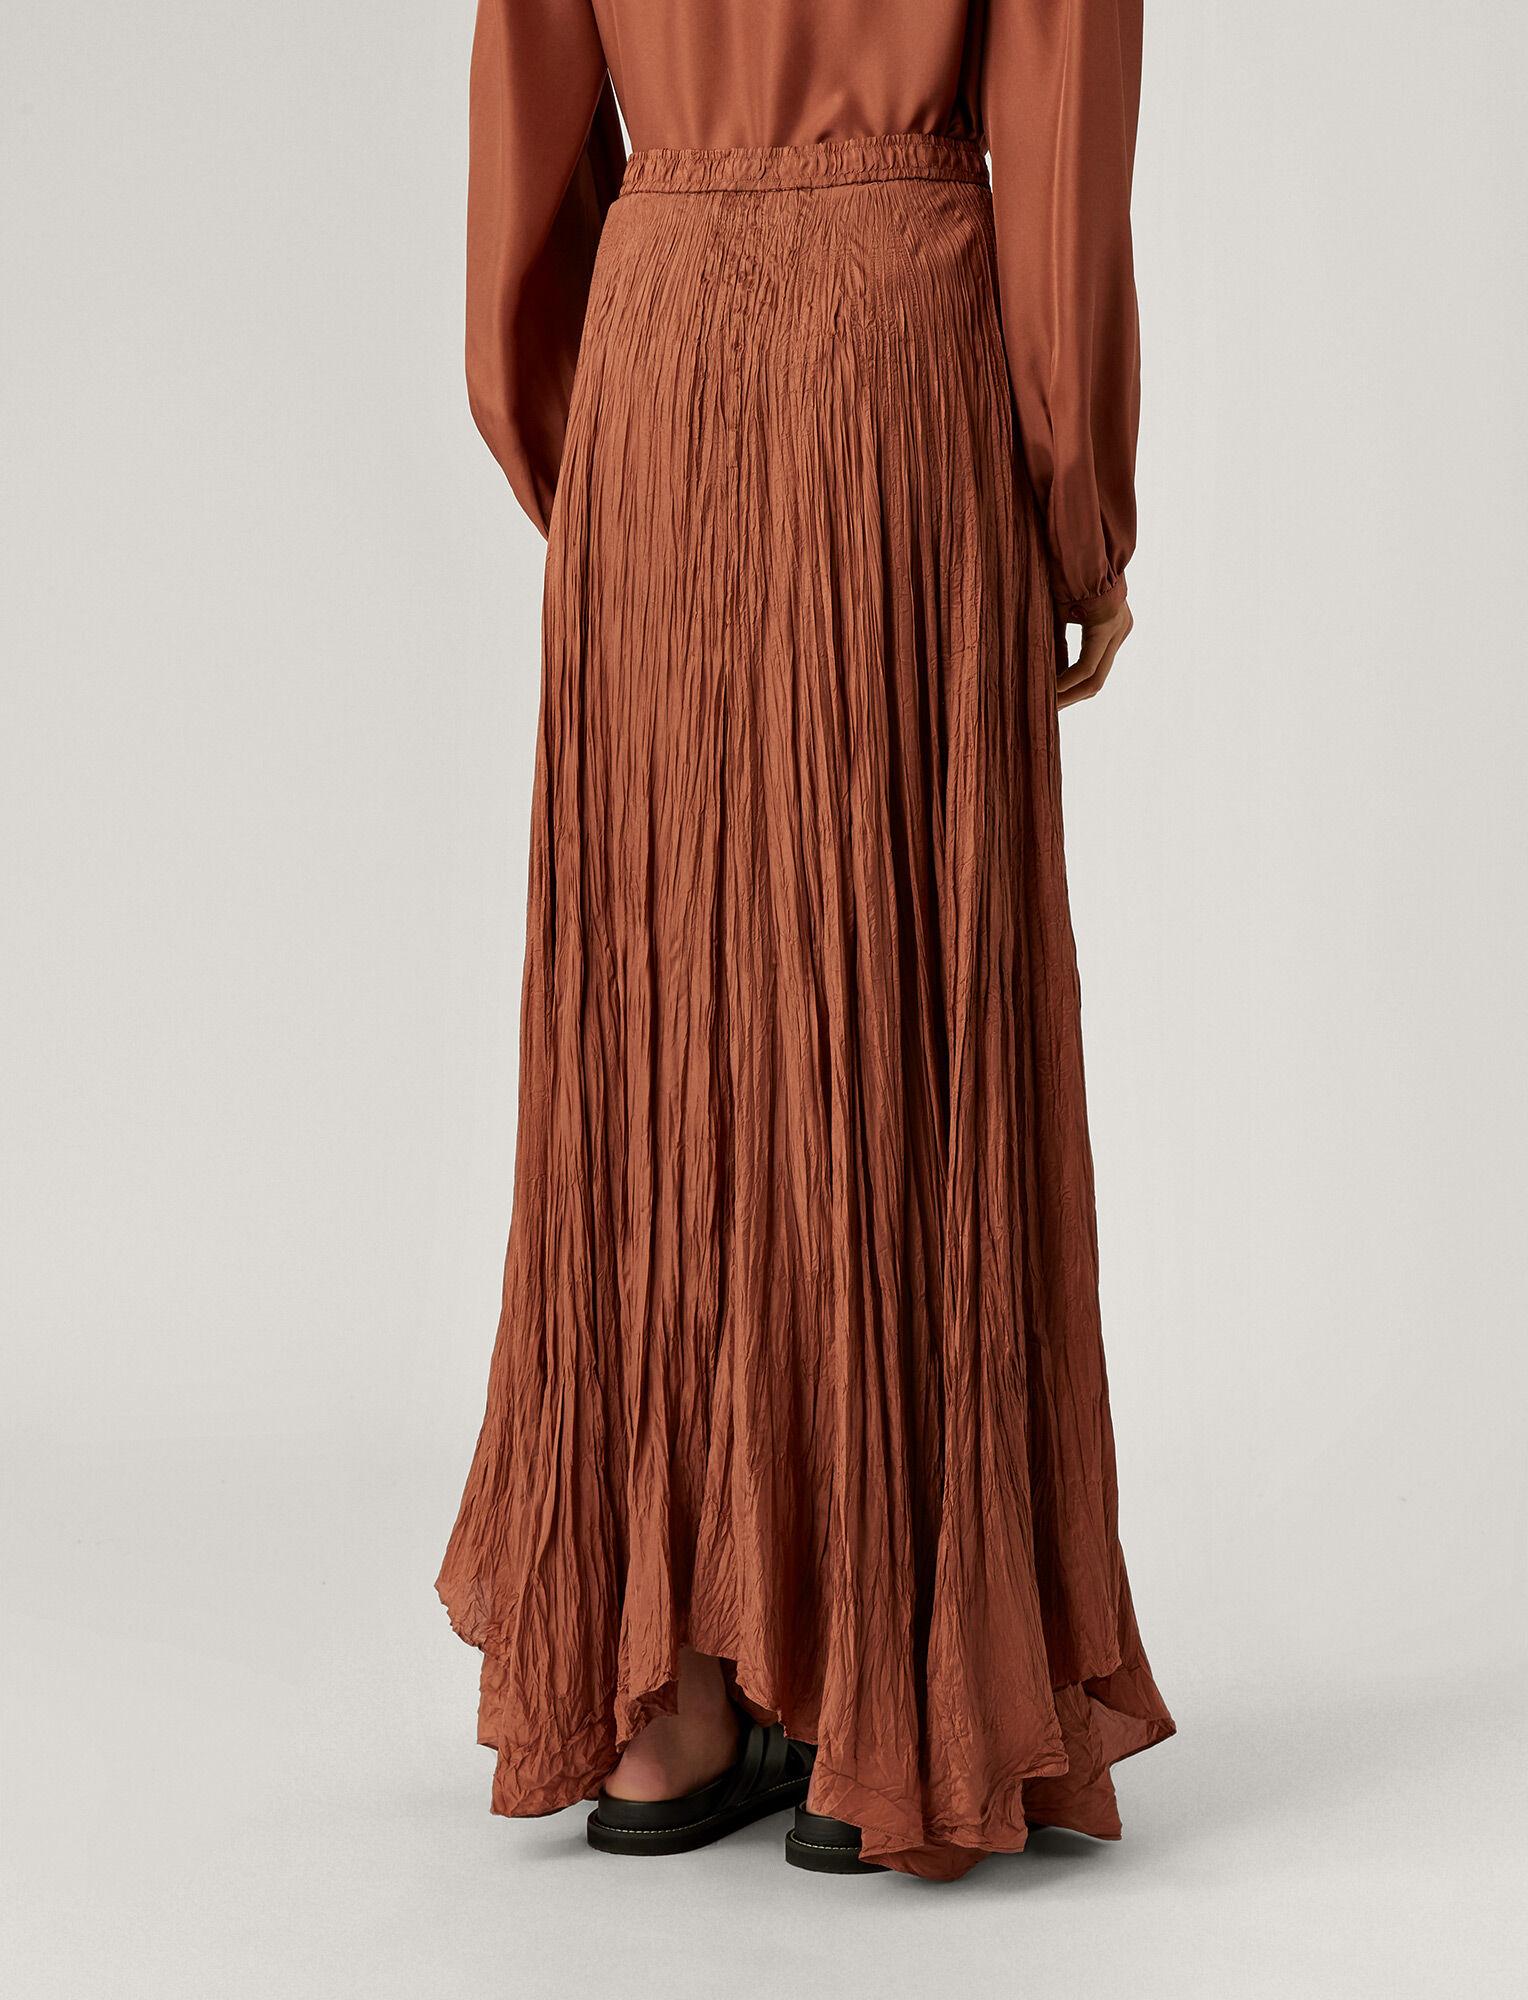 Joseph, Nanco Silk Habotai Skirt, in DUSTY ROSE